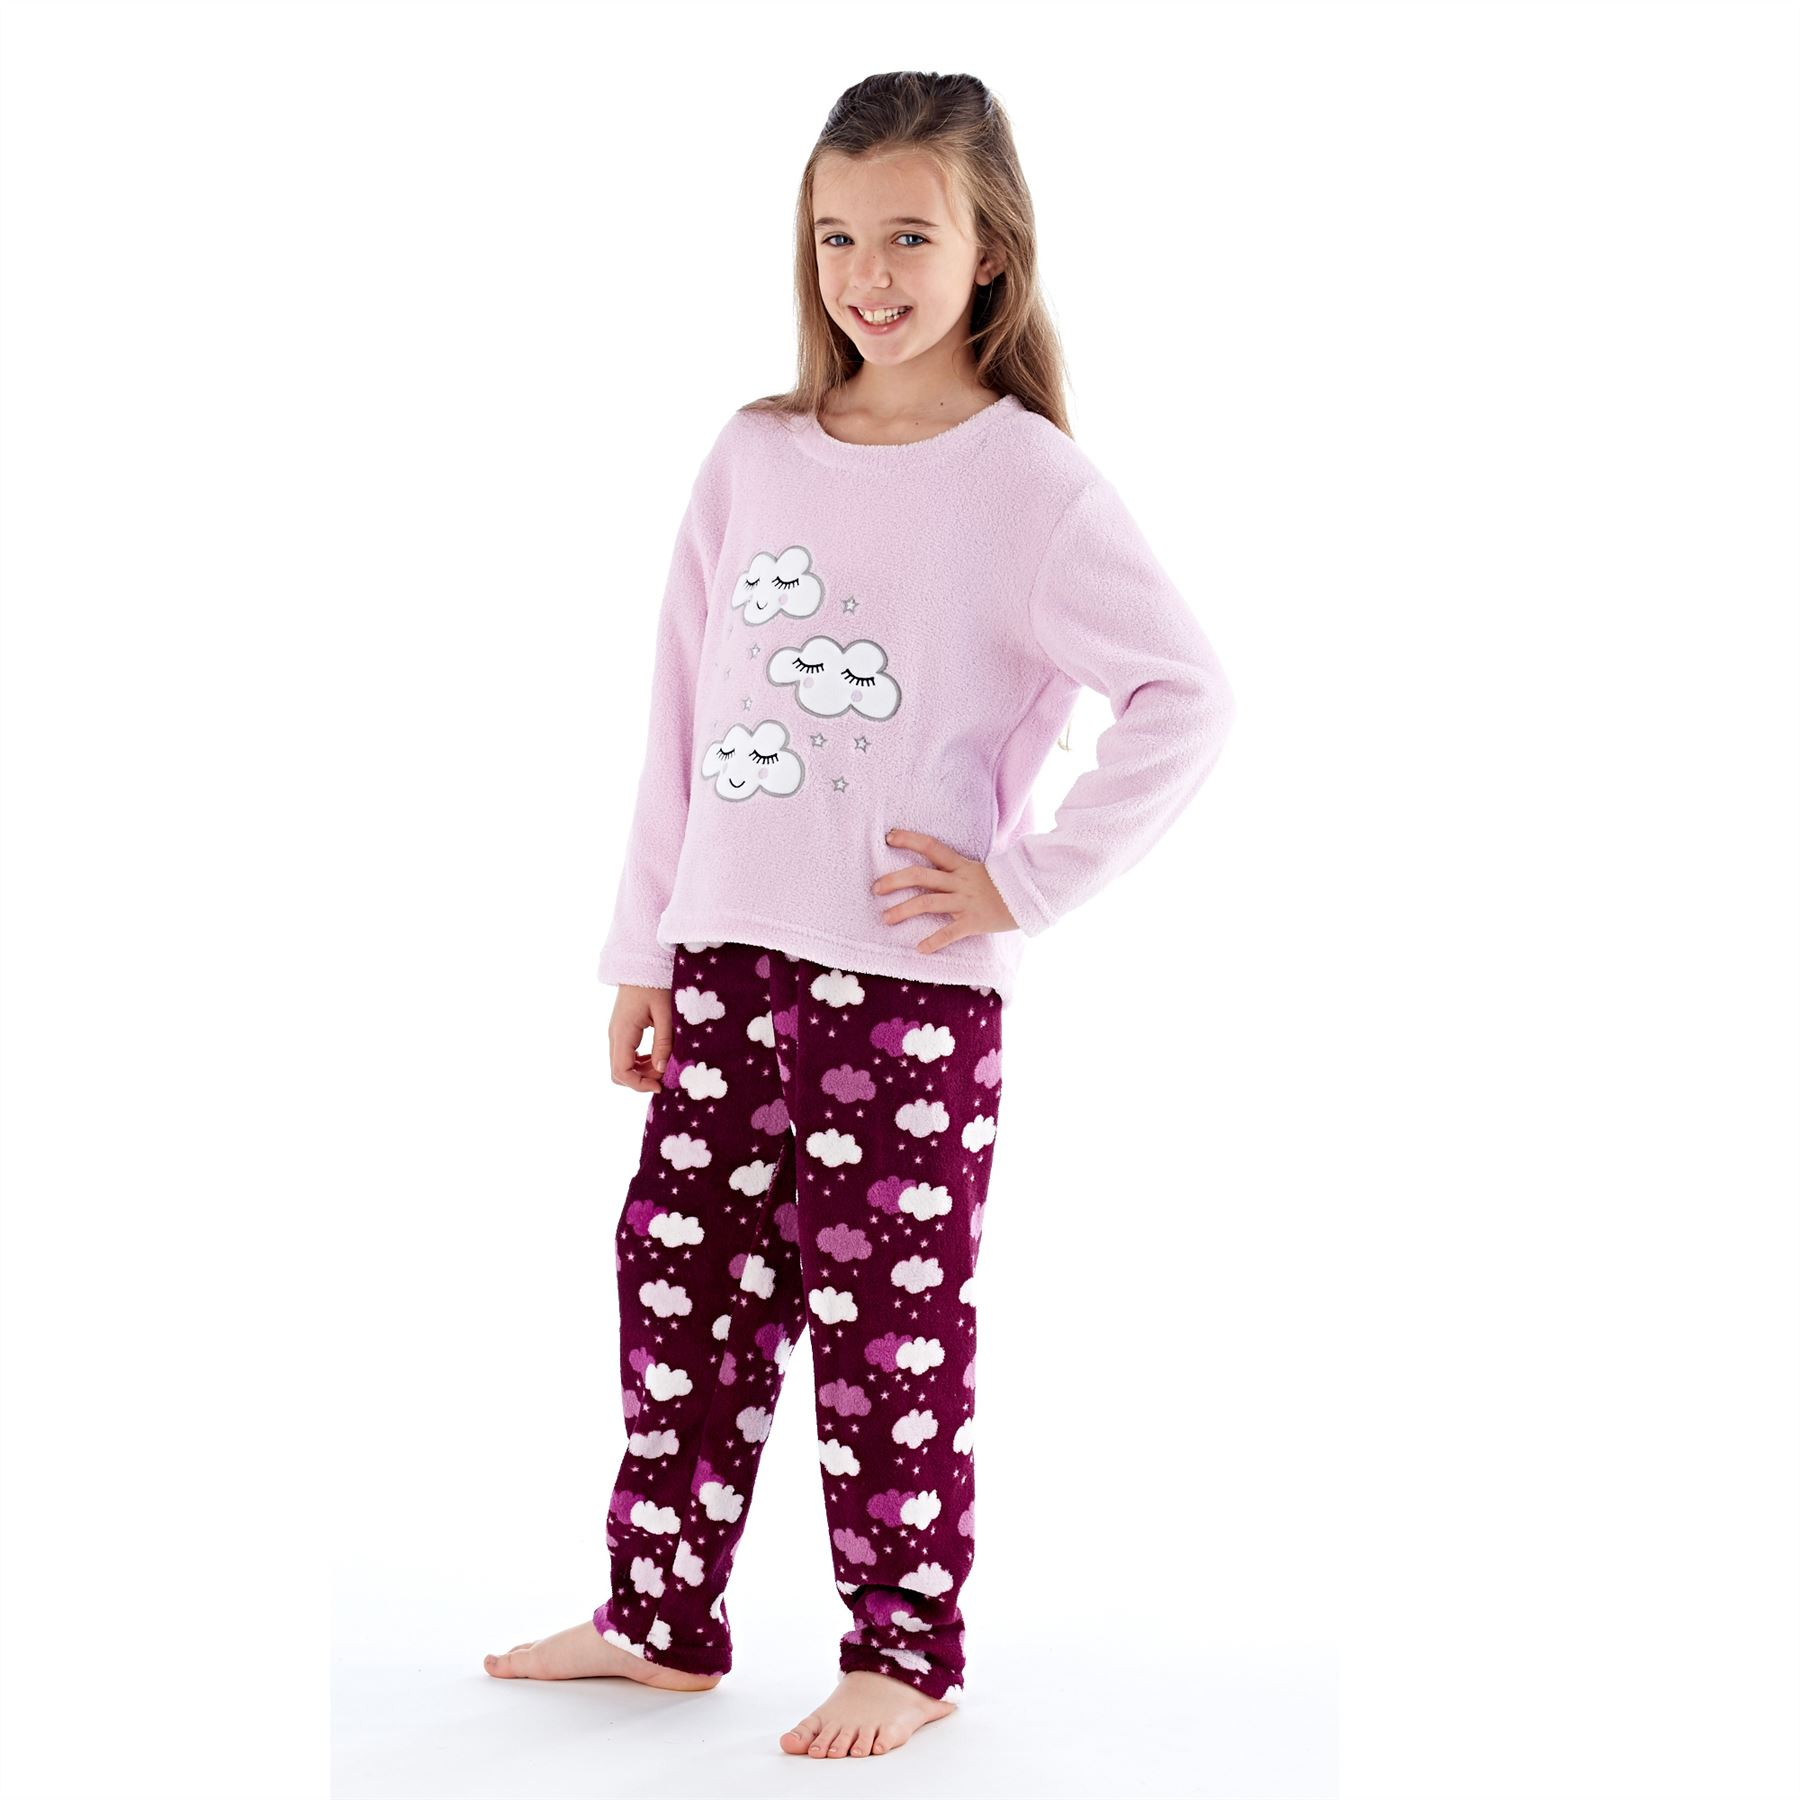 Girls-Boys-Fleece-Pyjamas-Childrens-Pyjama-Set-Kids-PJs-Age-2-13-Years thumbnail 22